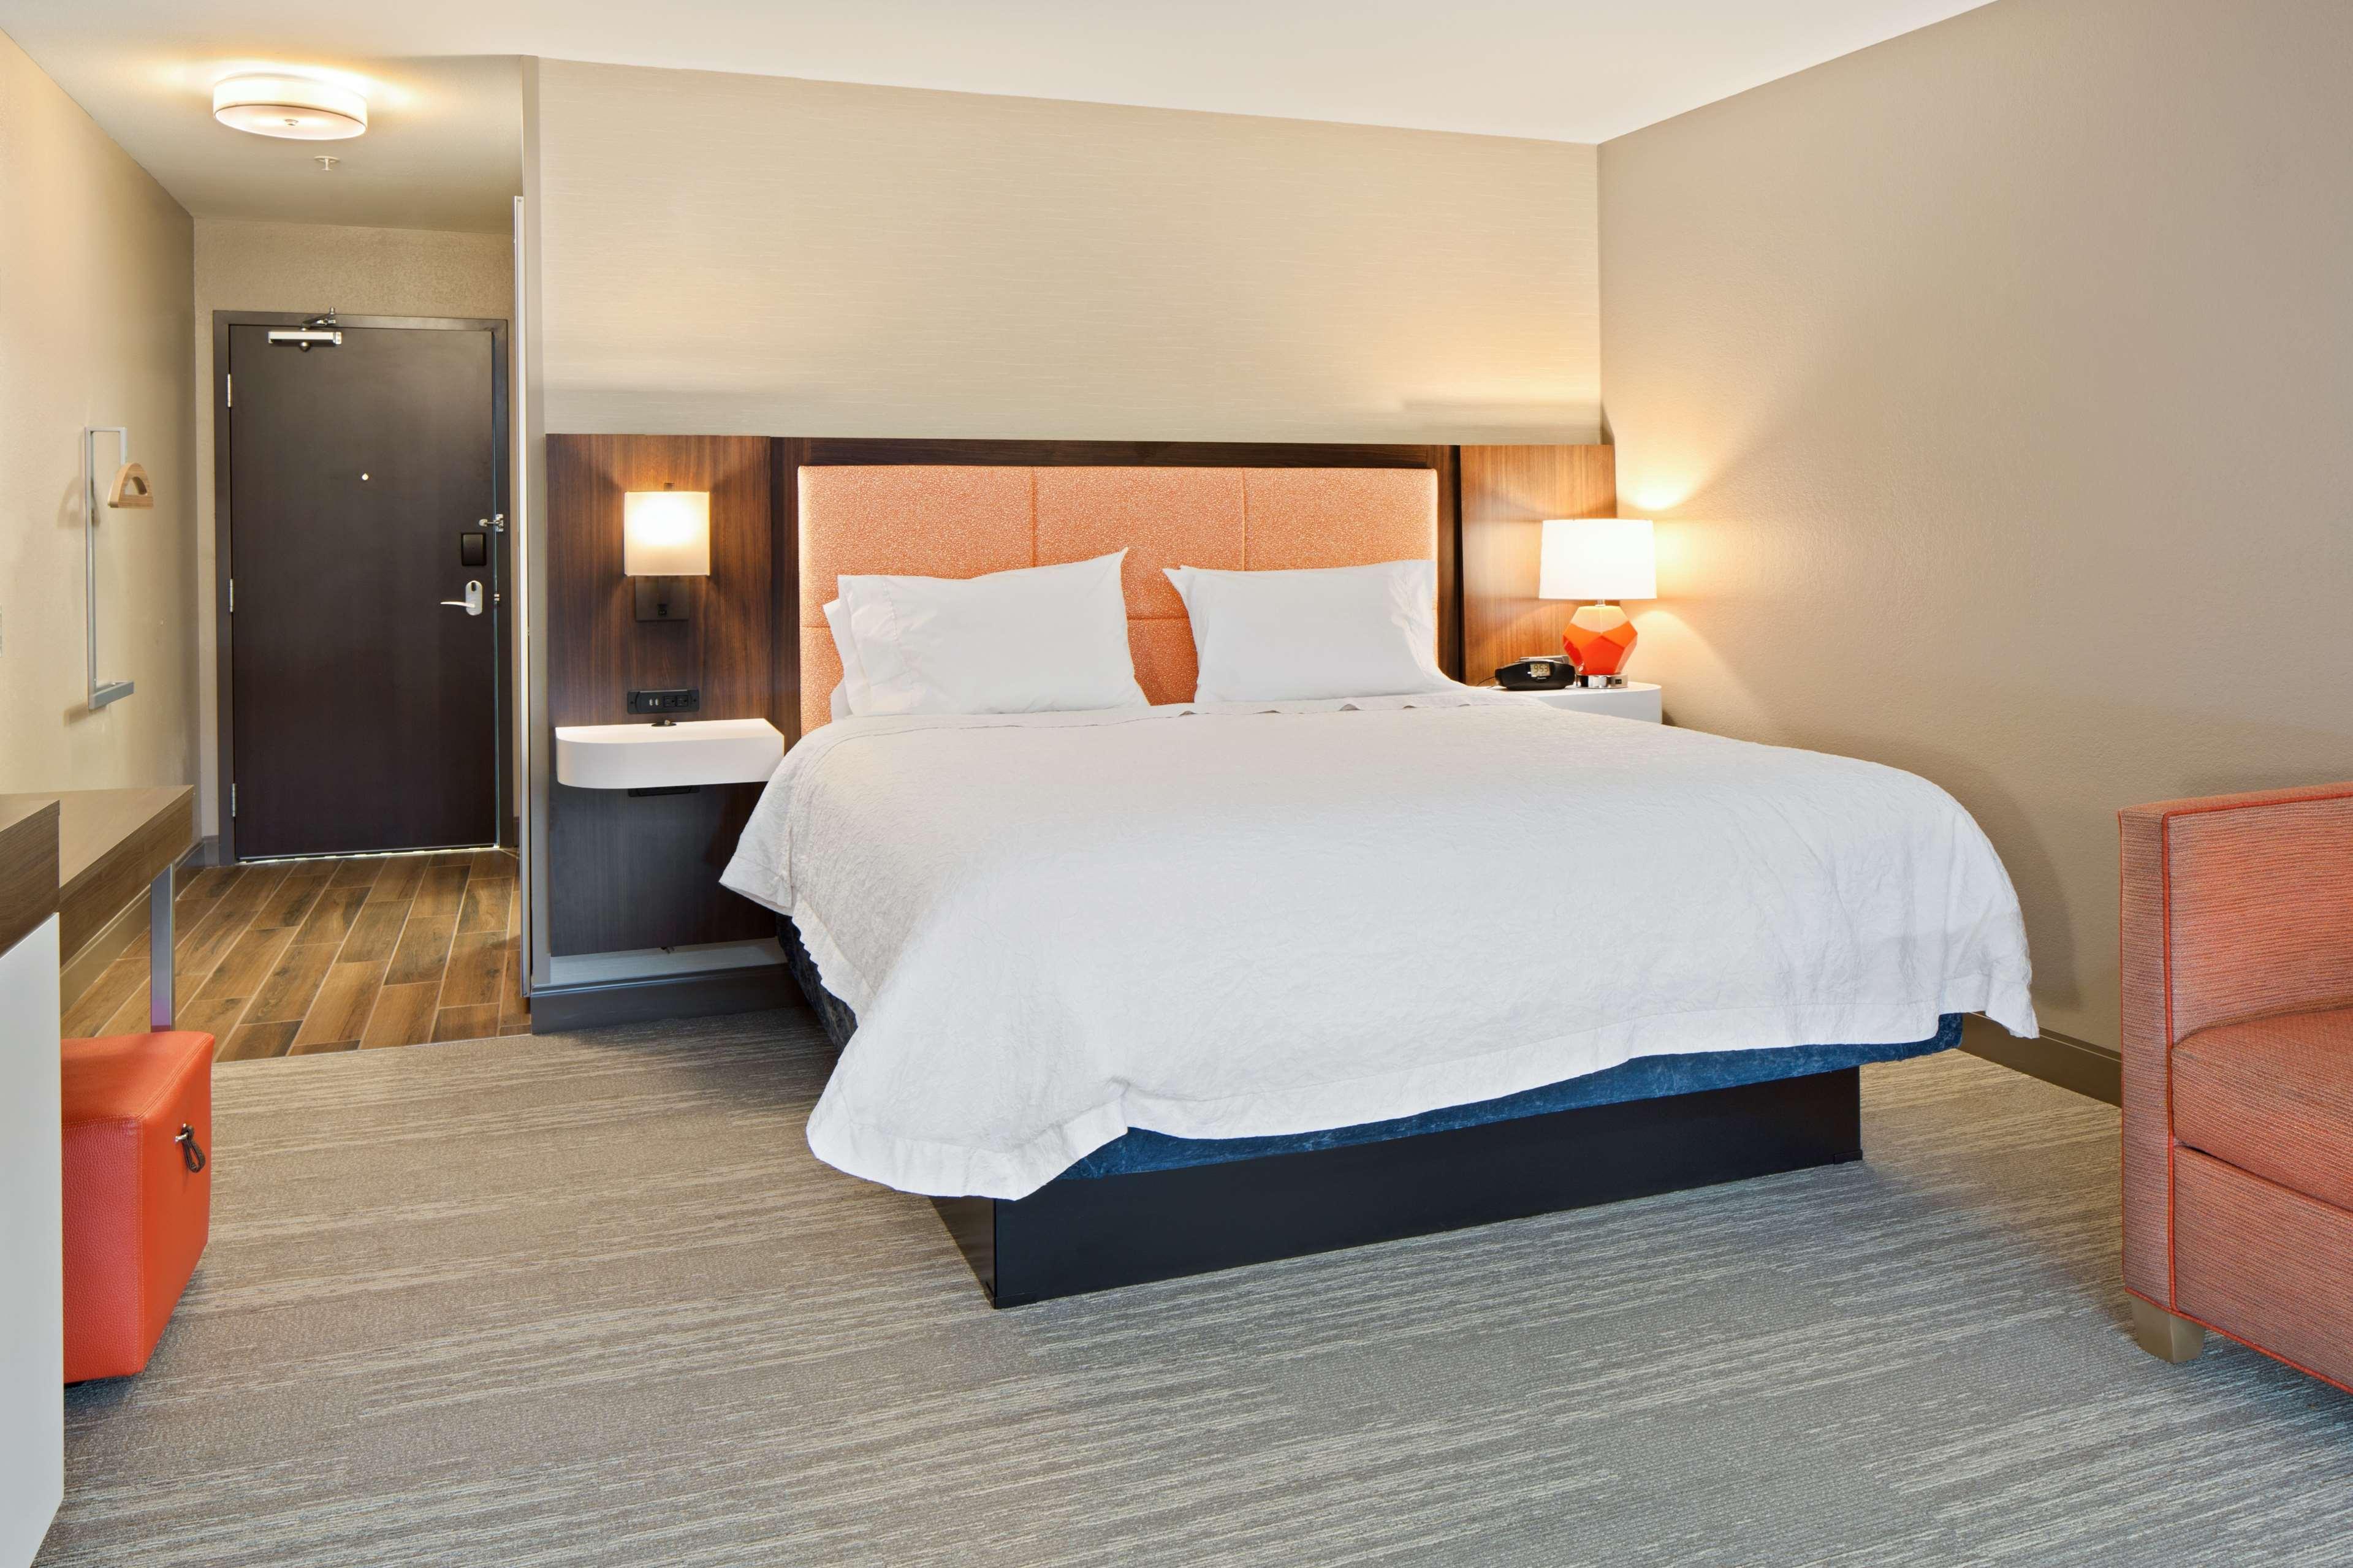 Hampton Inn & Suites Spokane Valley image 22